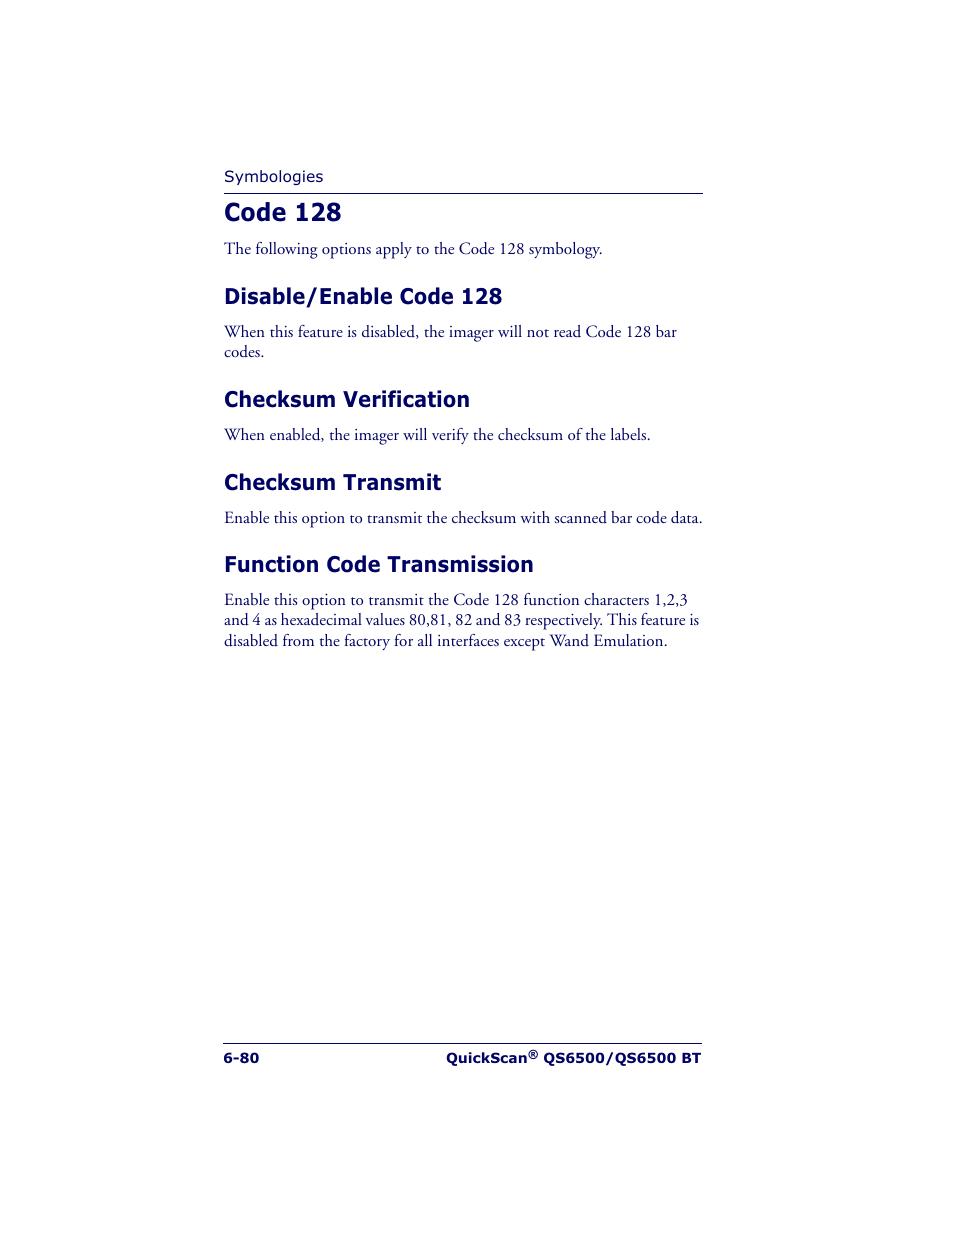 Code 128, Disable/enable code 128, Checksum verification | Datalogic  Scanning QUICKSCAN QS6500BT User Manual | Page 168 / 336